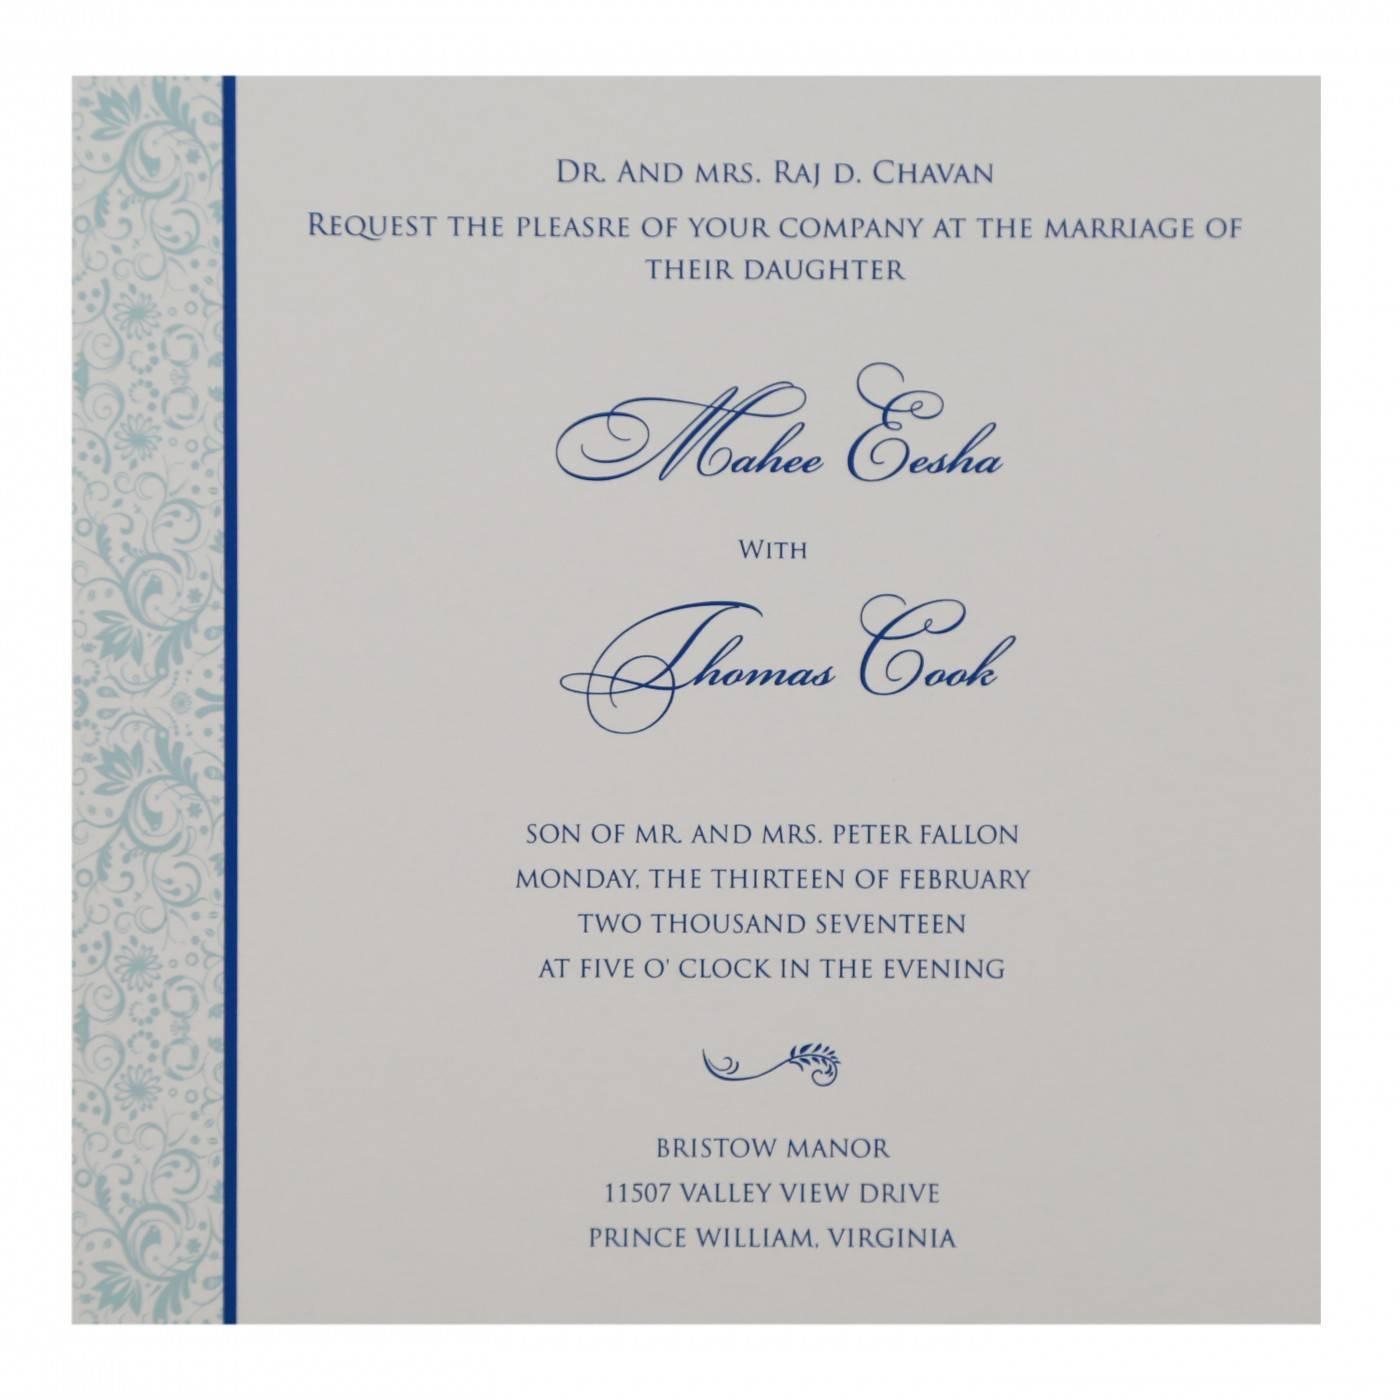 SKY BLUE SHIMMERY PAISLEY THEMED - SCREEN PRINTED WEDDING CARD : CG-8264H - IndianWeddingCards